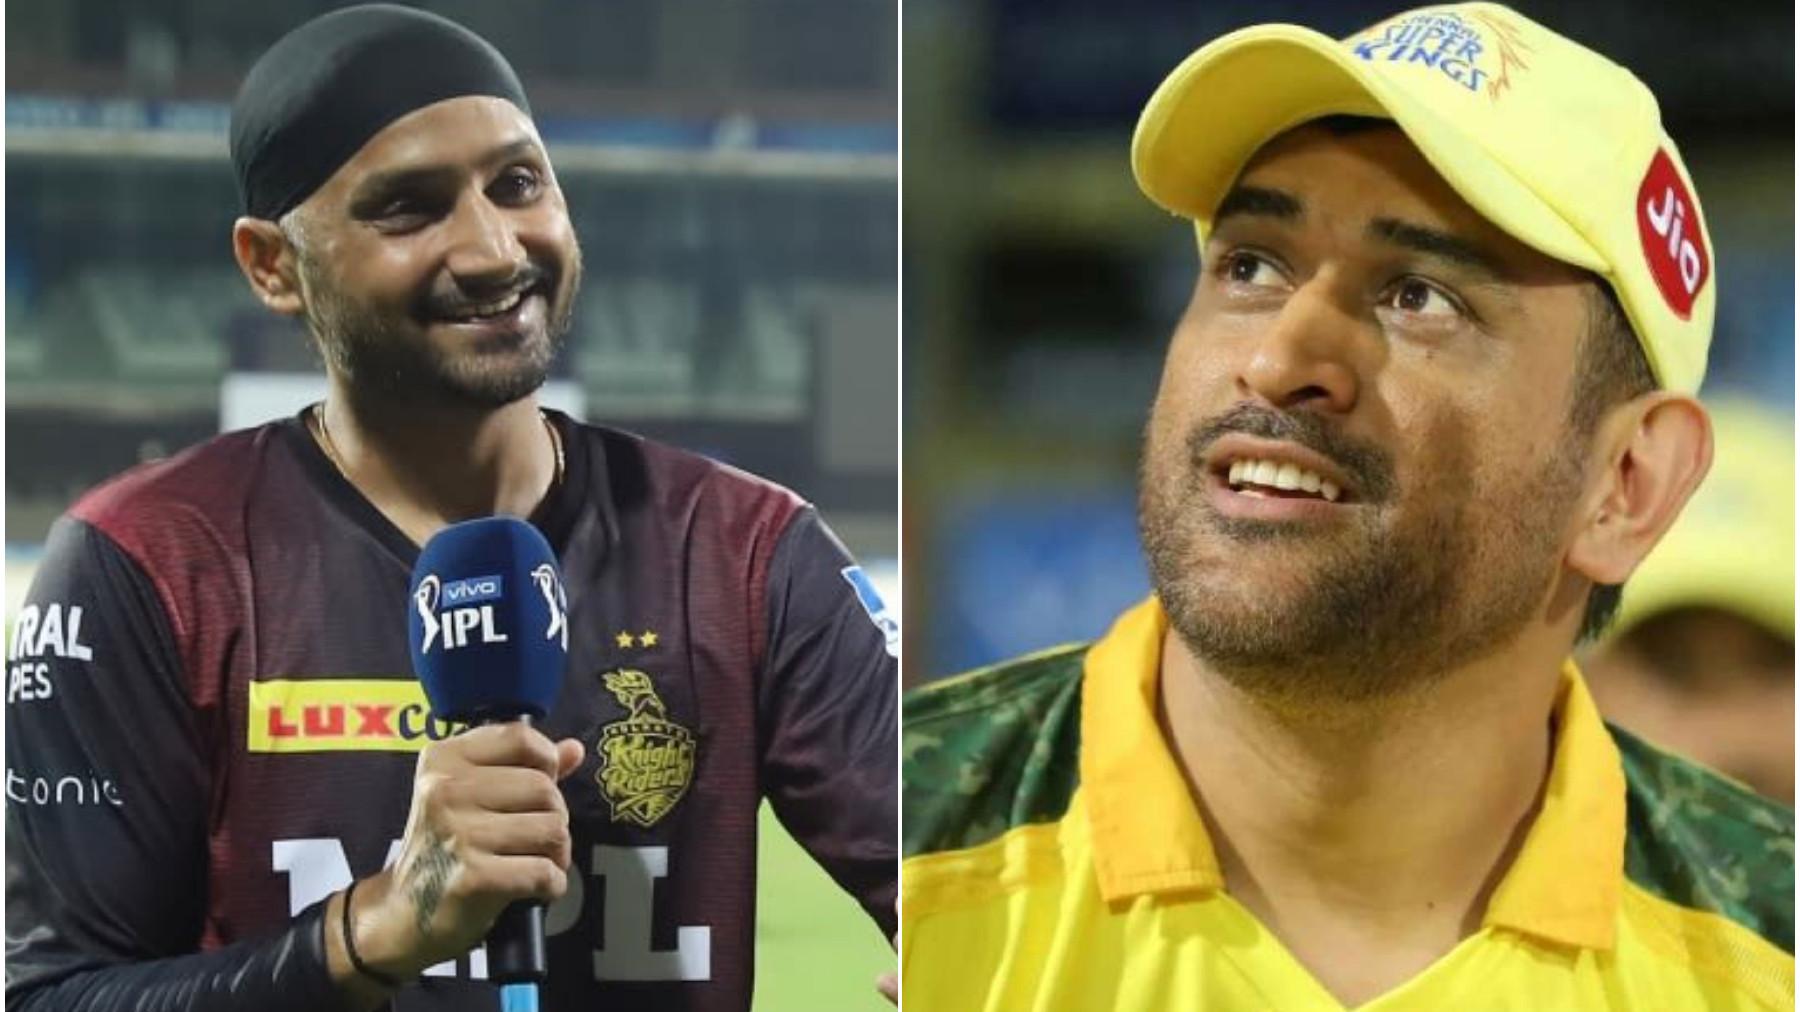 IPL 2021: Could be Dhoni's last IPL season; he'll completely focus on winning the title- Harbhajan Singh